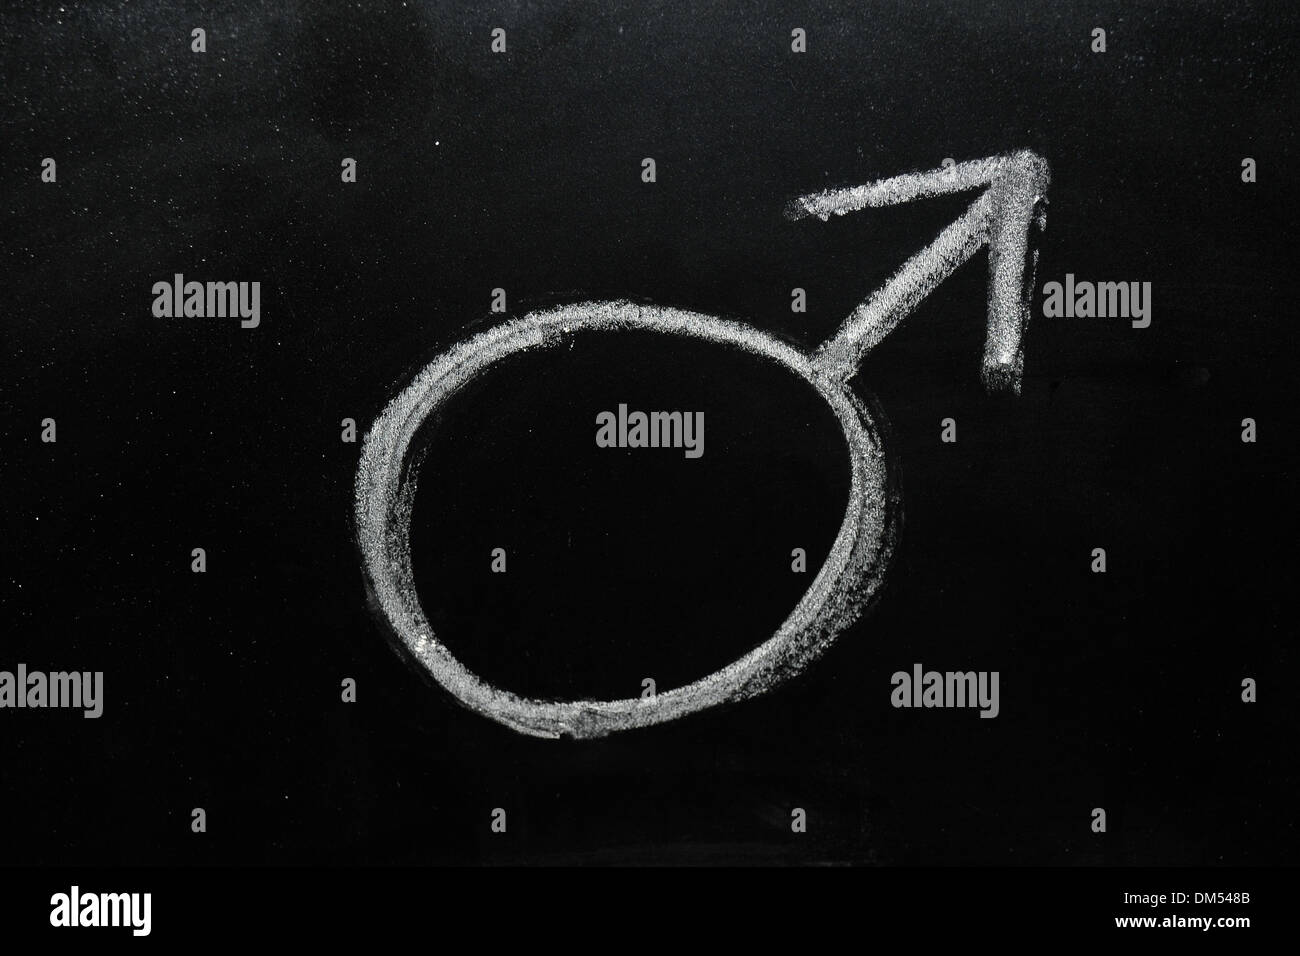 Male gender symbol drawn on a blackboard in chalk. - Stock Image